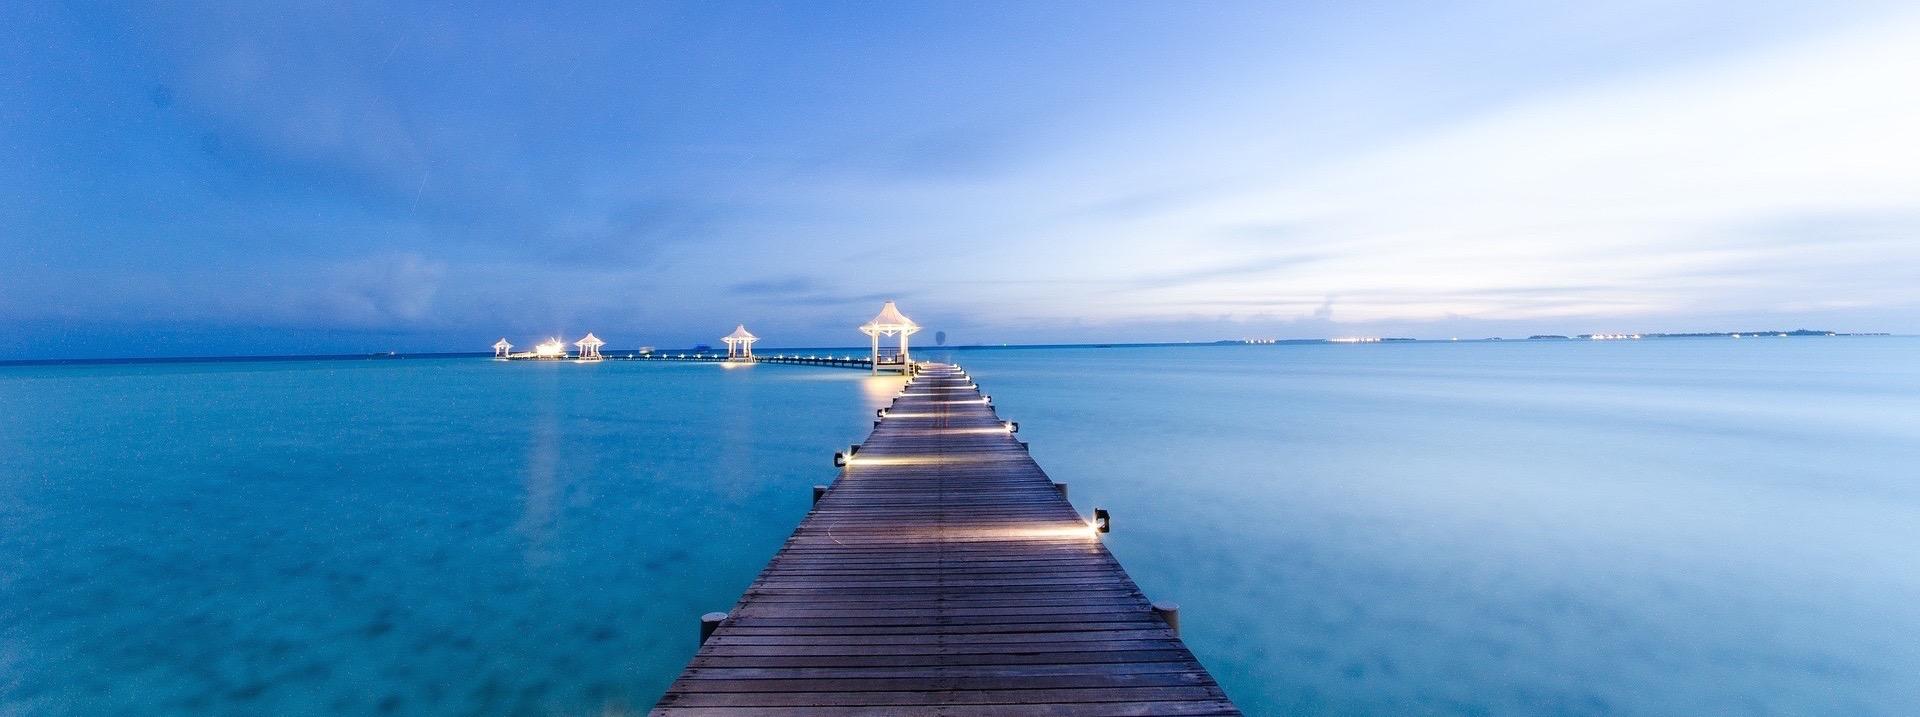 http://milletours.com/new/wp-content/uploads/2017/06/MALDIVES.jpg